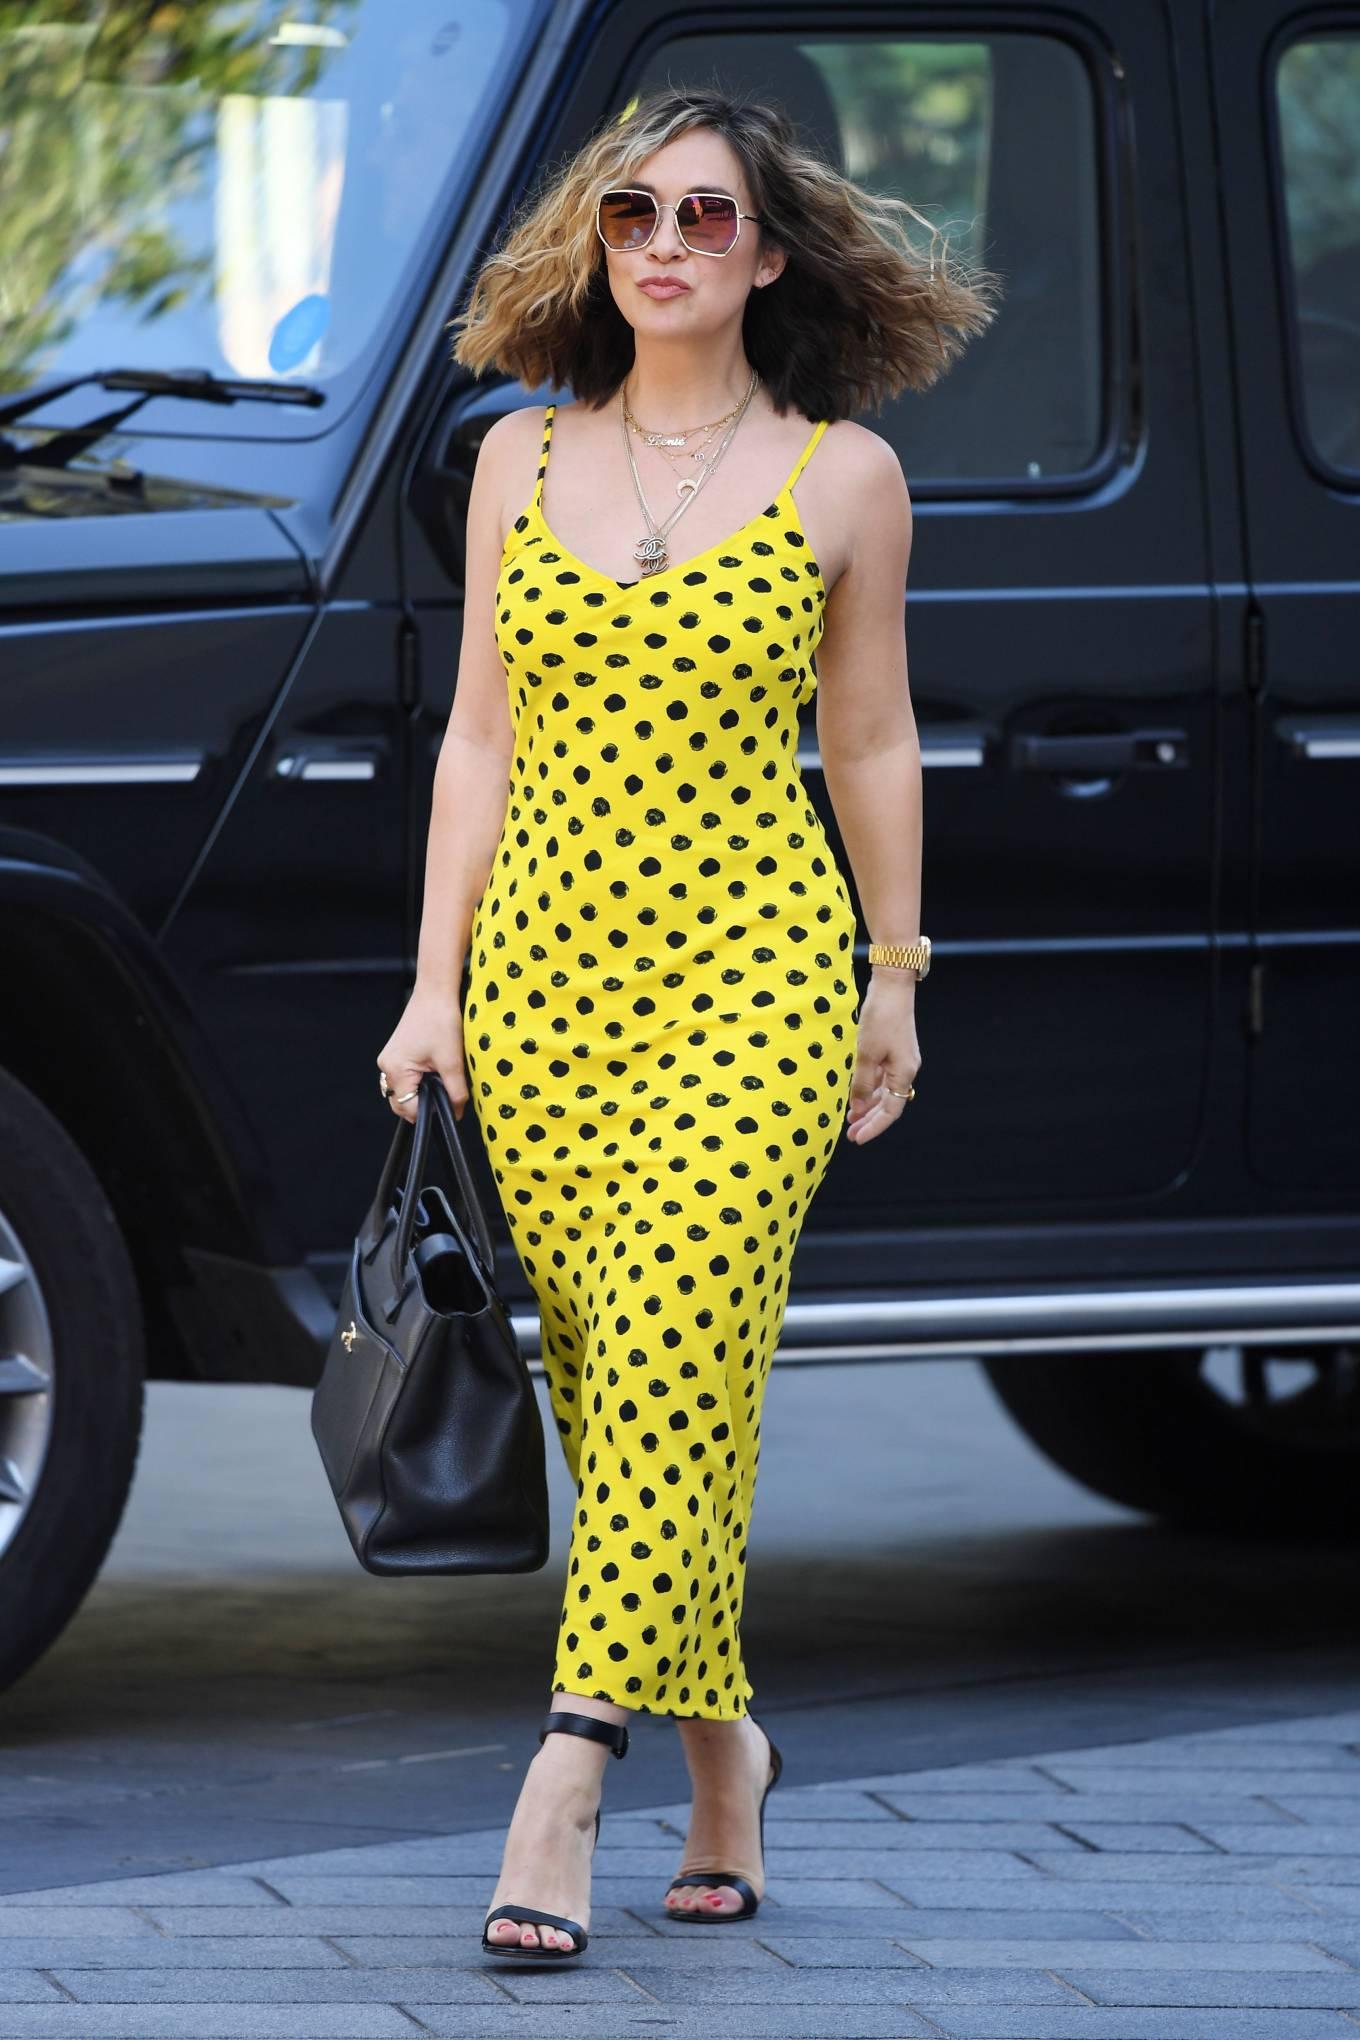 Myleene Klass 2020 : Myleene Klass – In yellow polka dot dress in London-22